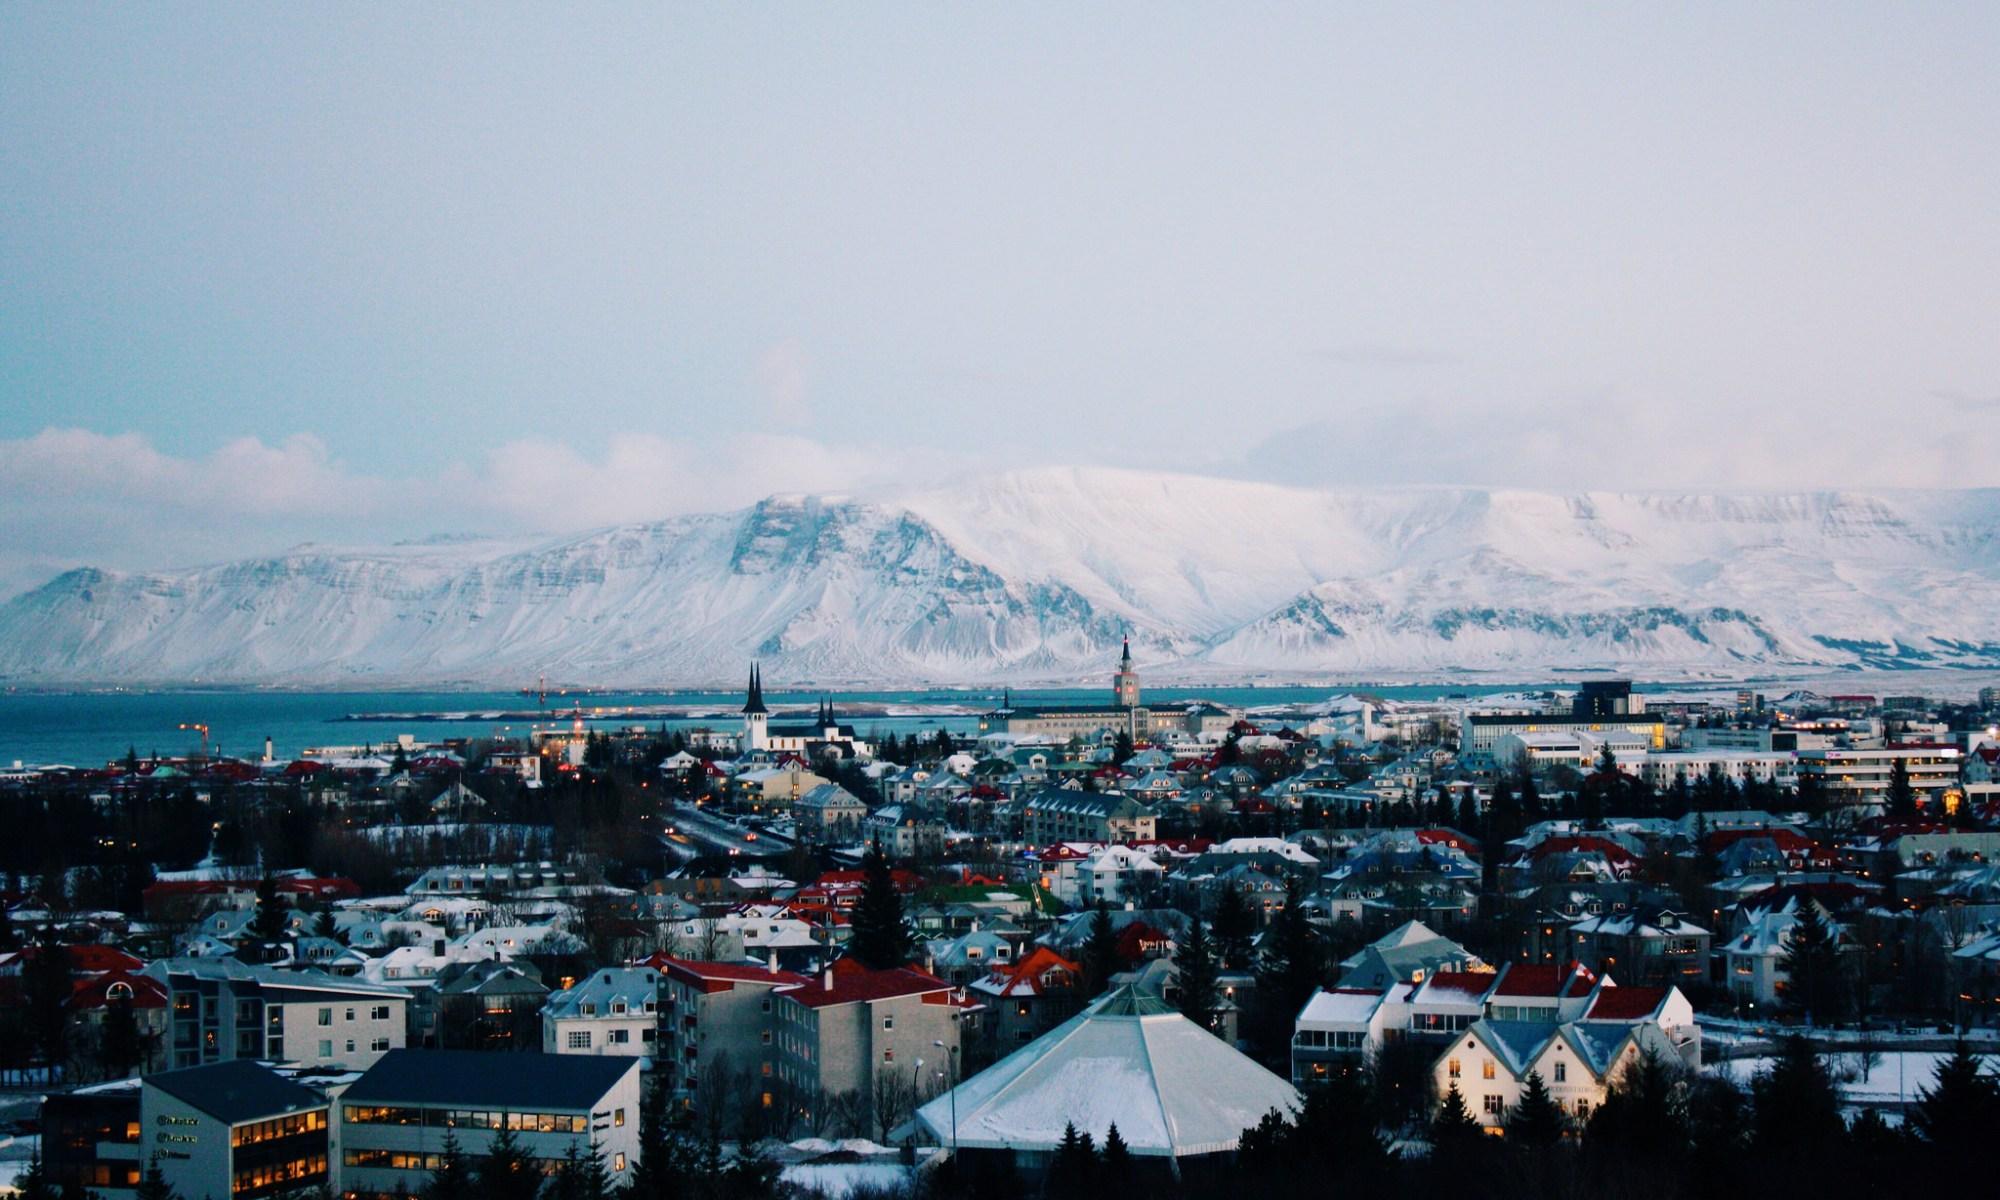 View of Reyjavik